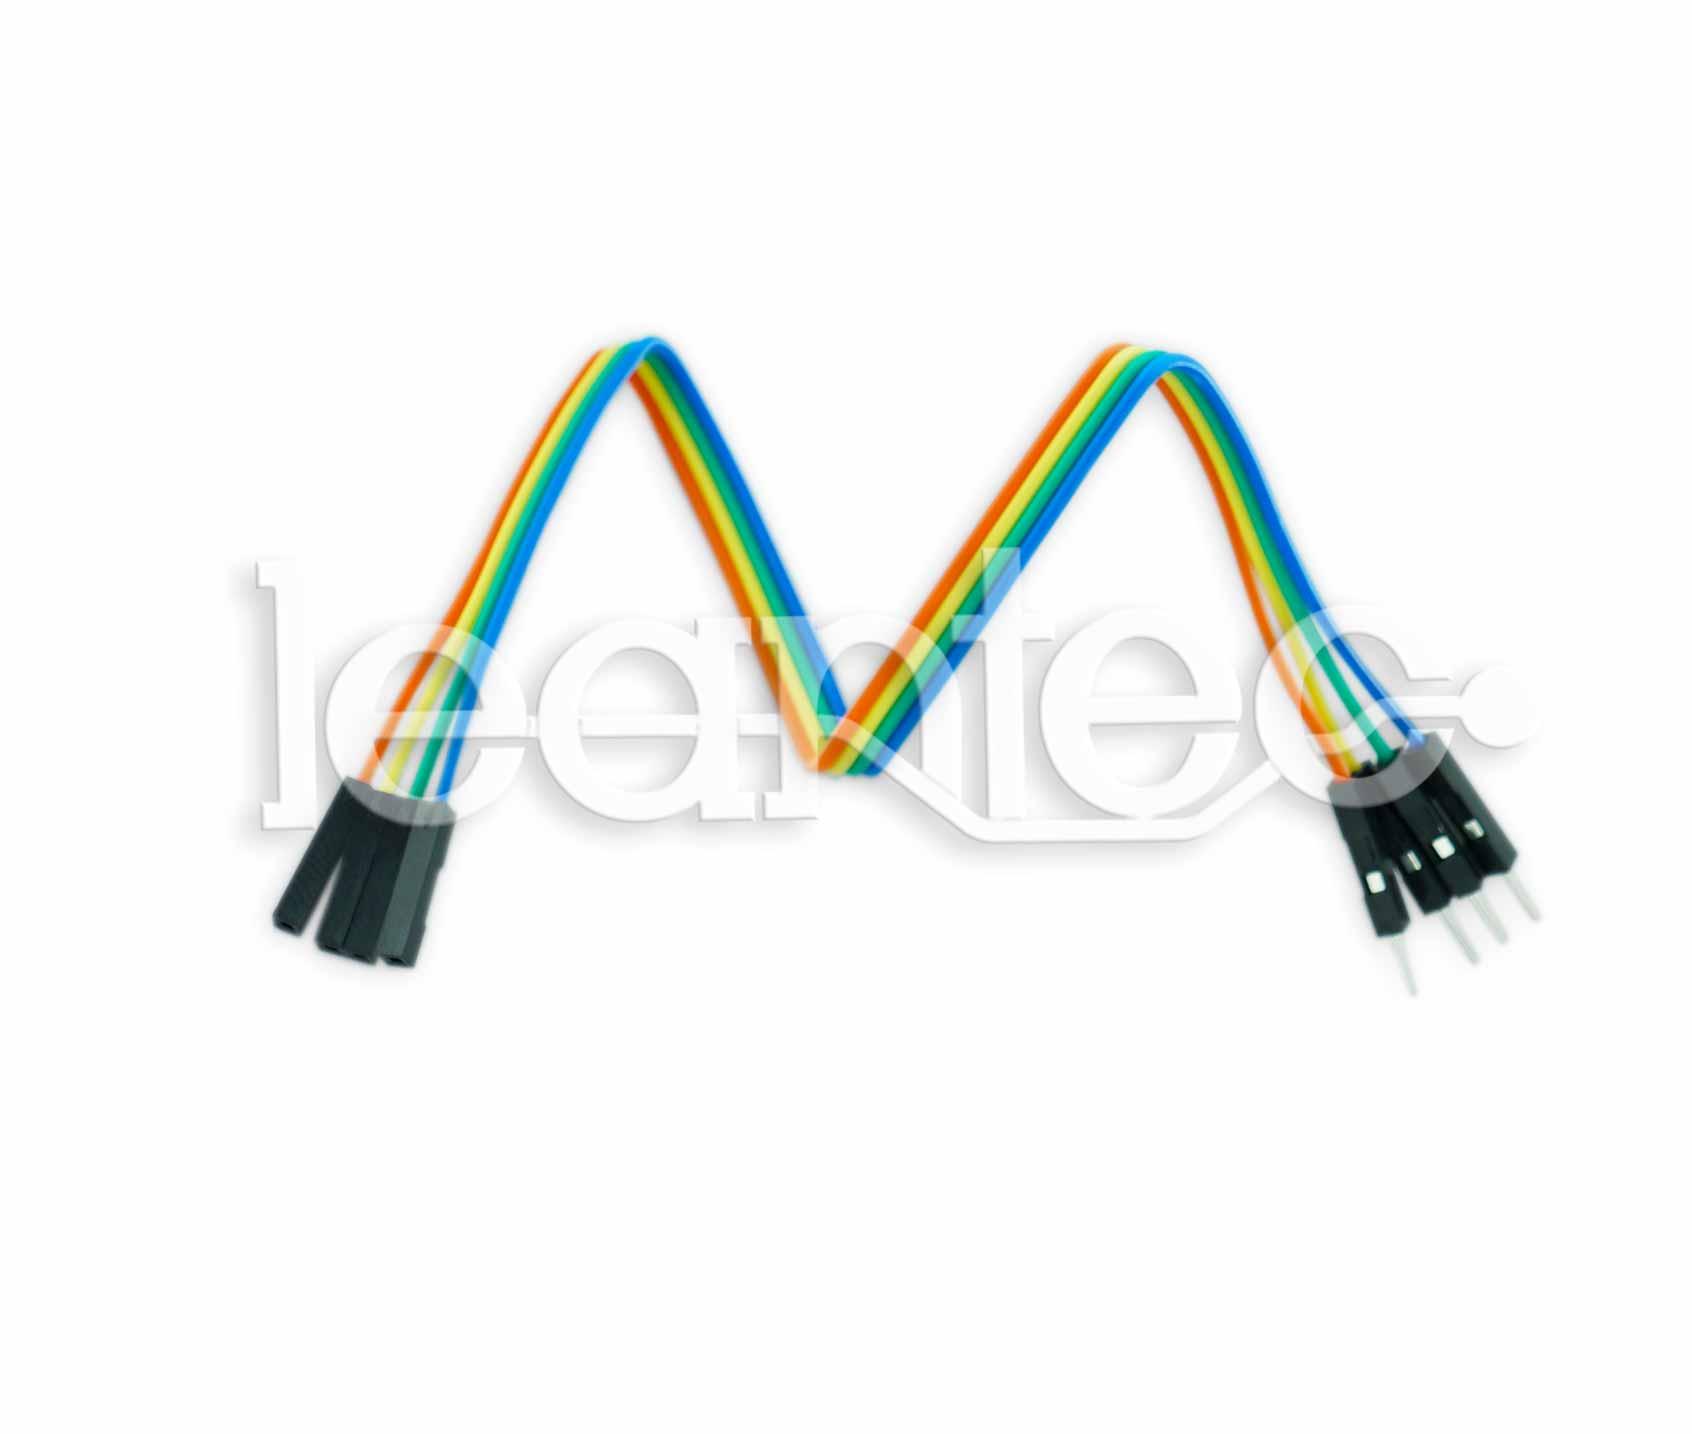 cables protoboard leantec